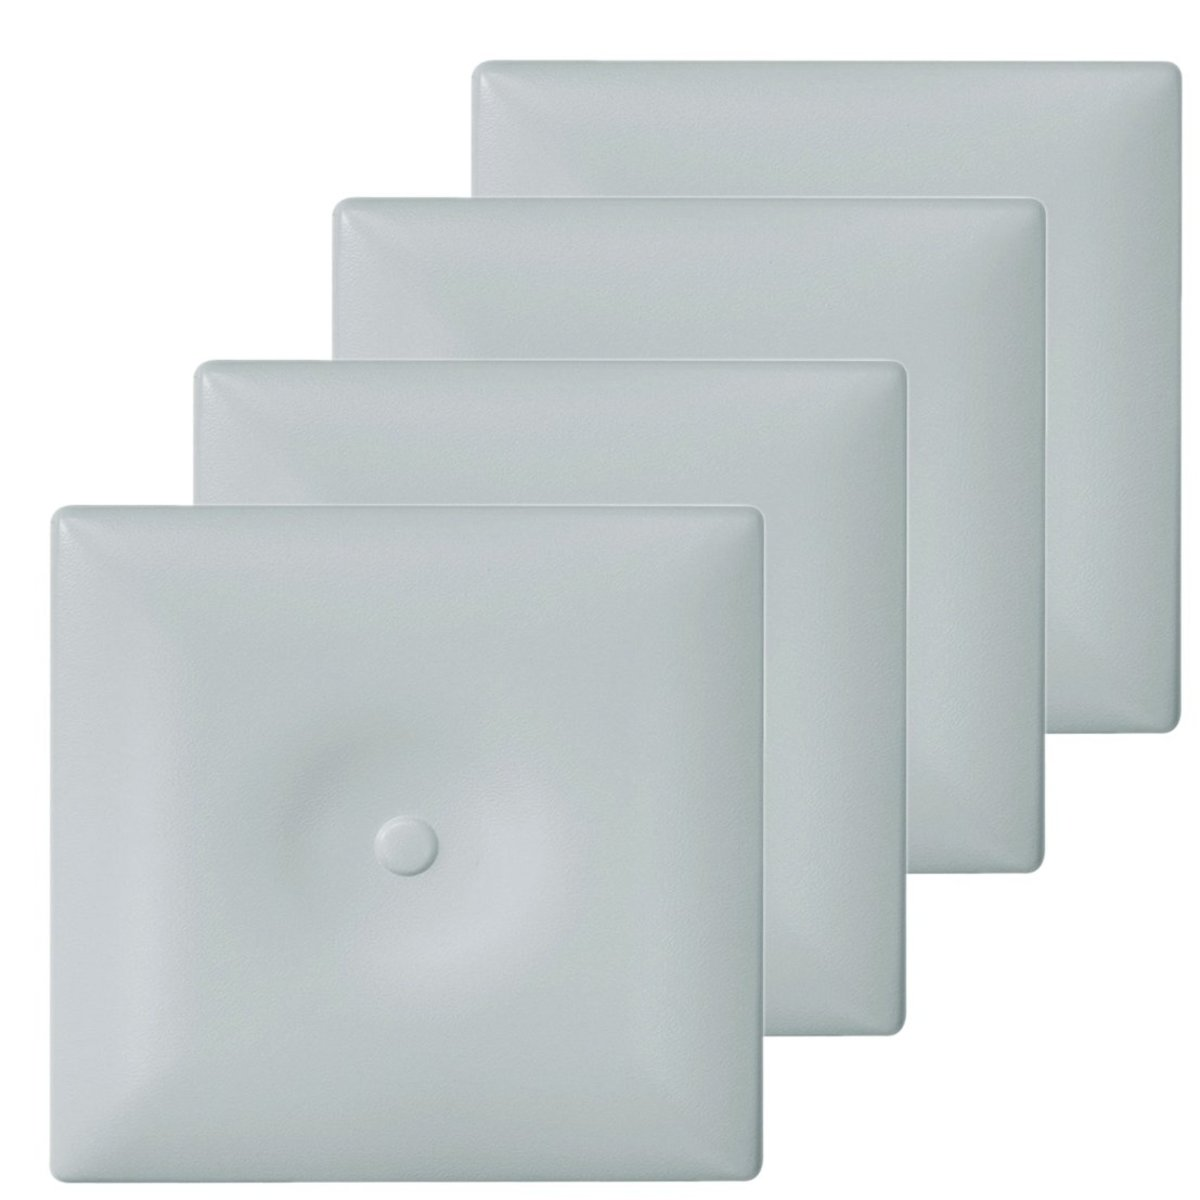 aguard Soft Wall Mat 30x30cm - Grey ( 4pcs)